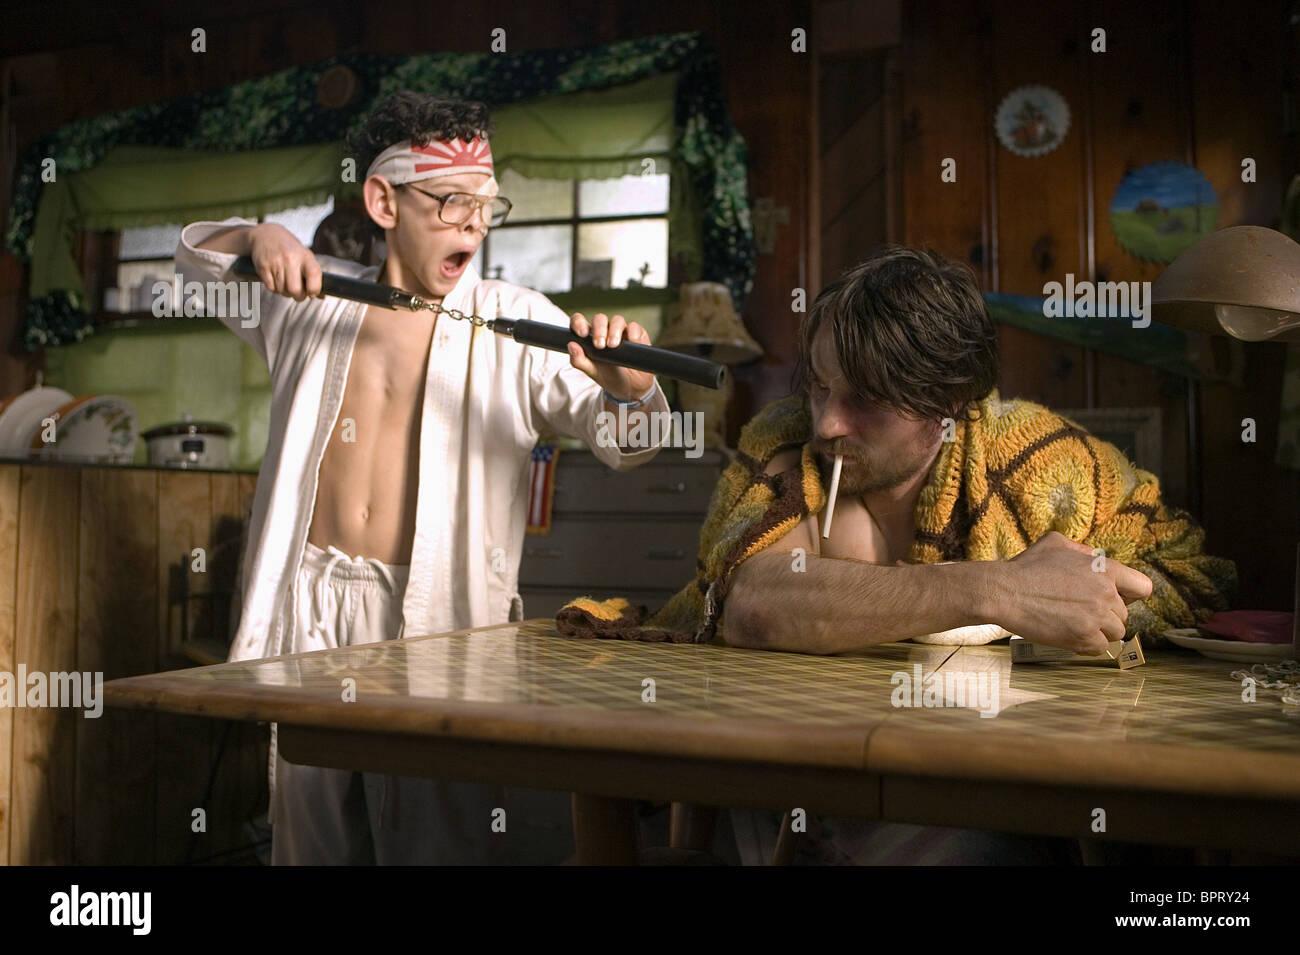 ZACH CUMER & MARTIN HENDERSON SMOKIN' ACES; SMOKING ACES (2006) Stock Photo